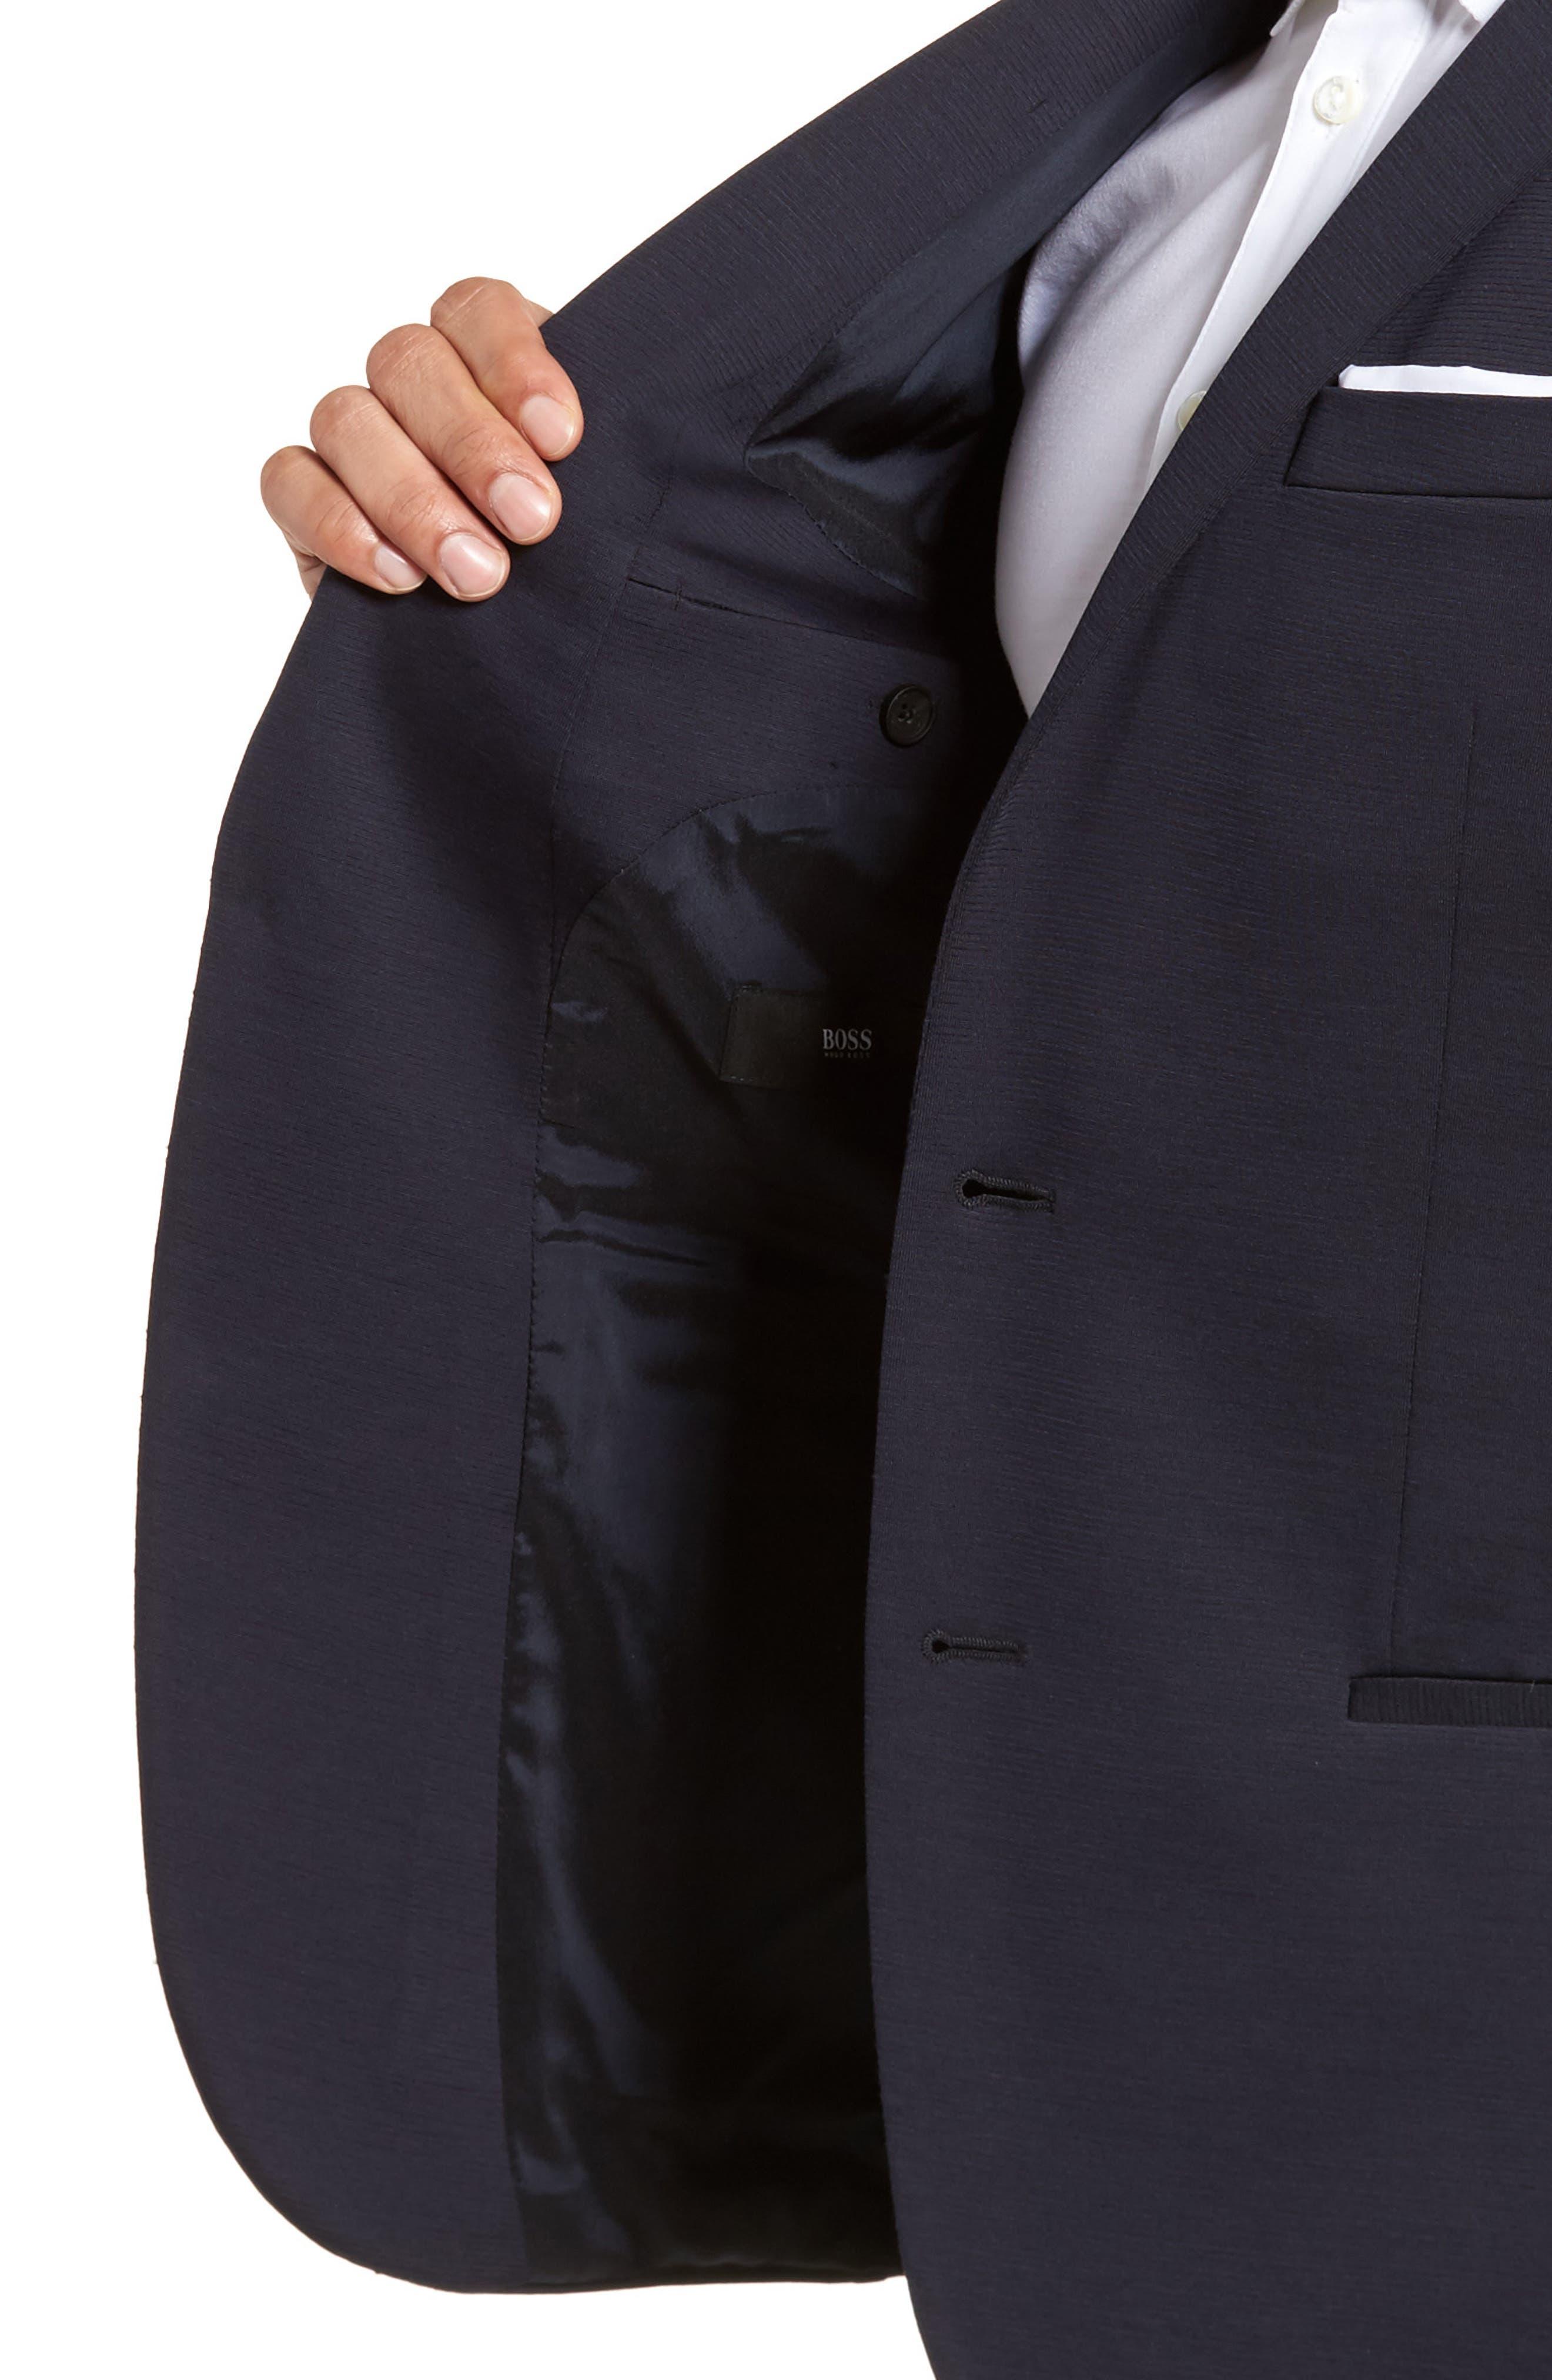 Norwin Trim Fit Wool Blend Sport Coat,                             Alternate thumbnail 4, color,                             410